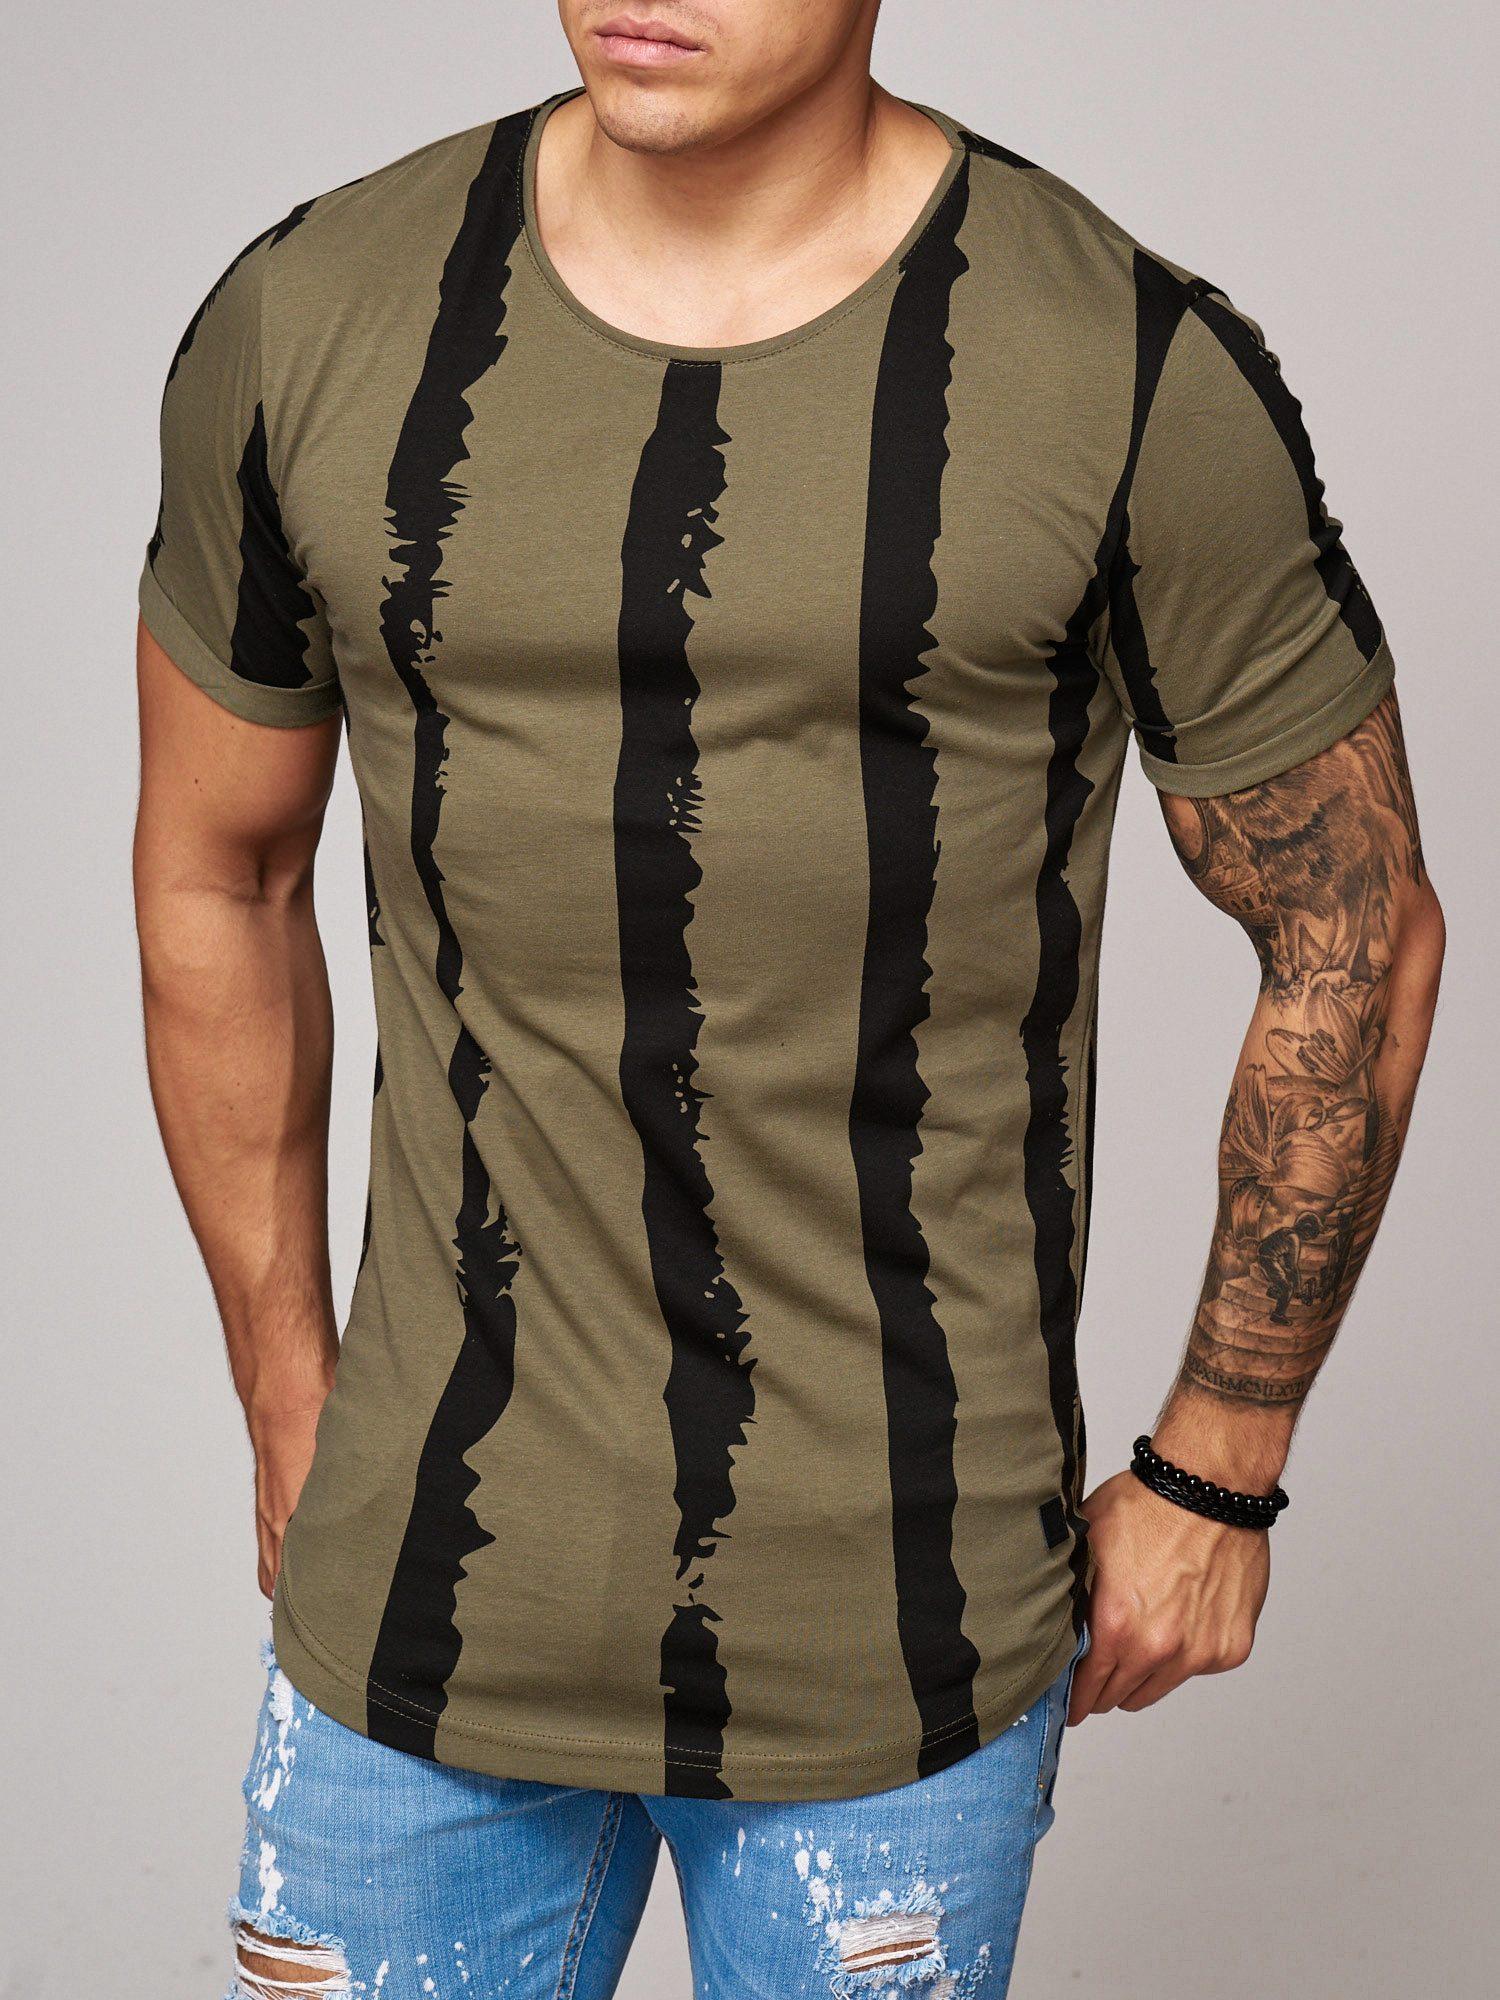 T-shirt-da-Uomo-Polo-Shirt-a-Maniche-Corte-printshirt-Polo-a-Maniche-Corte-17018-John-Kayna miniatura 16